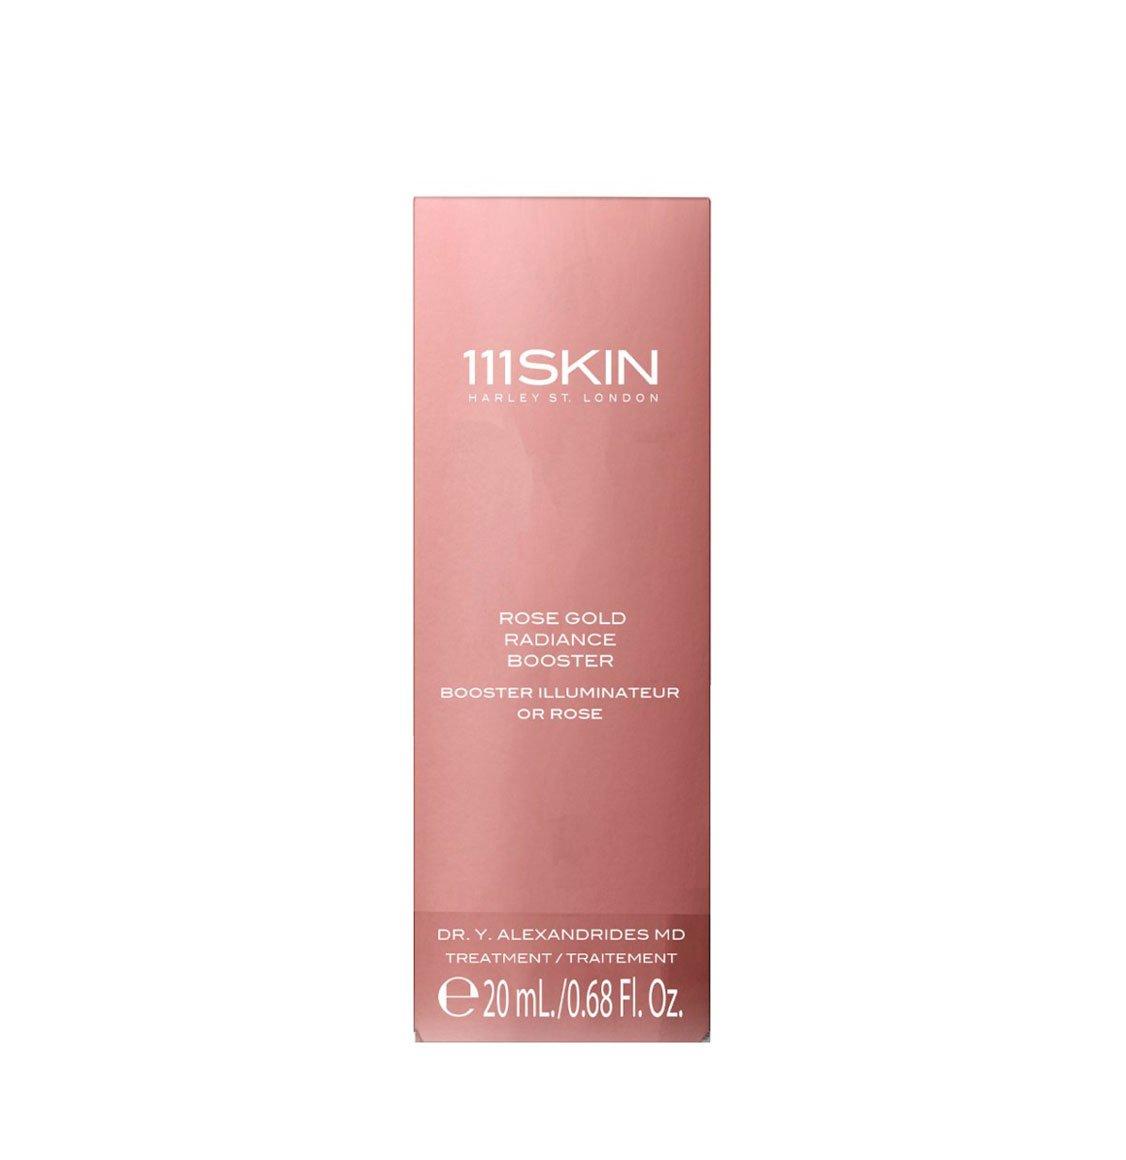 111Skin Rose Gold Radiance Booster 20ml